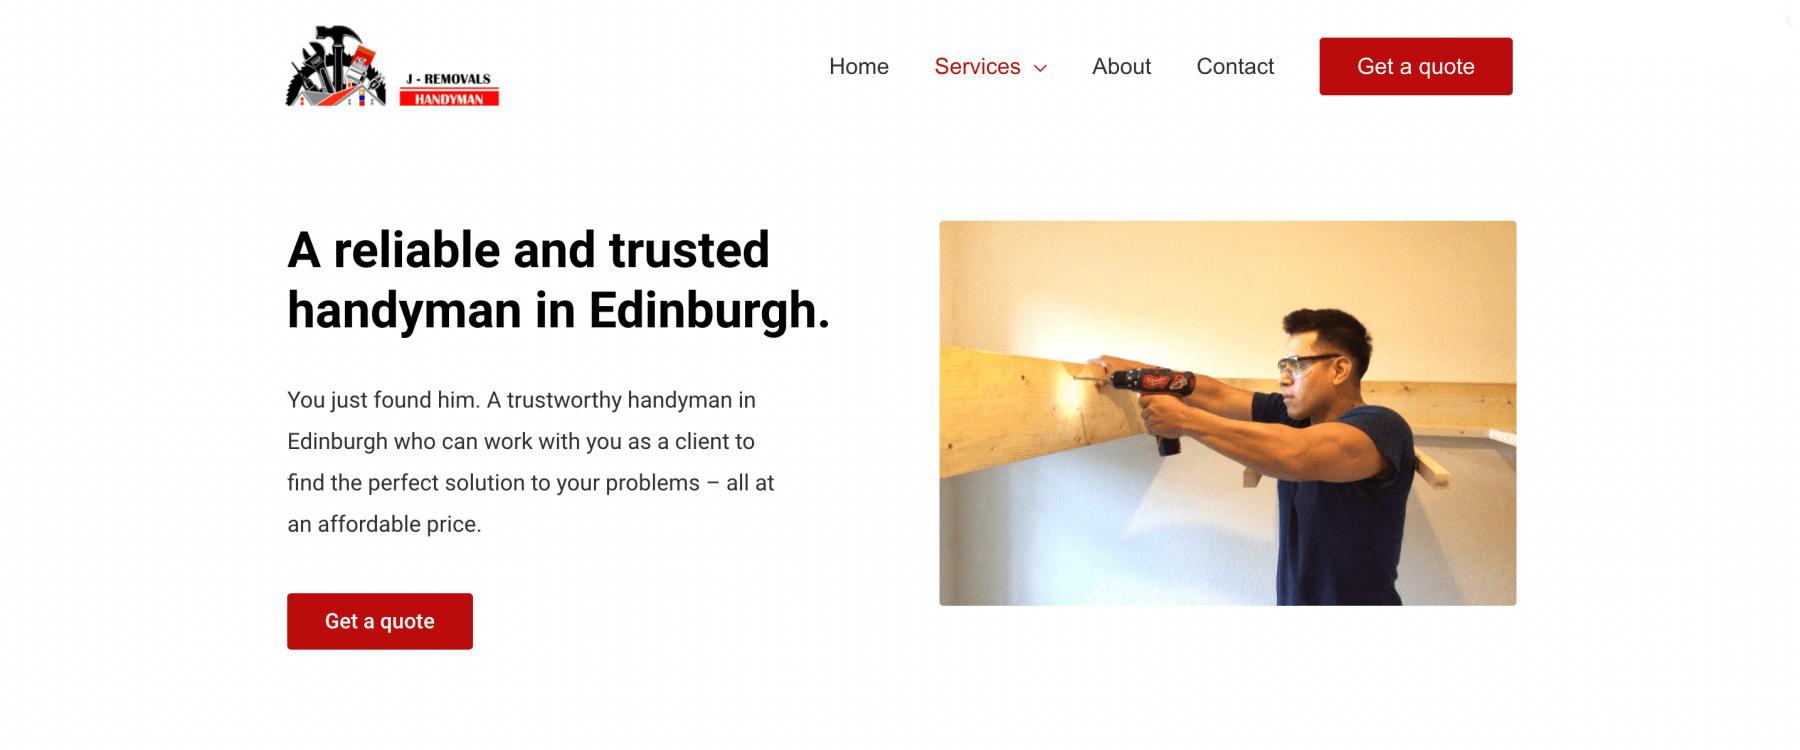 jacob removals and handyman website design edinburgh